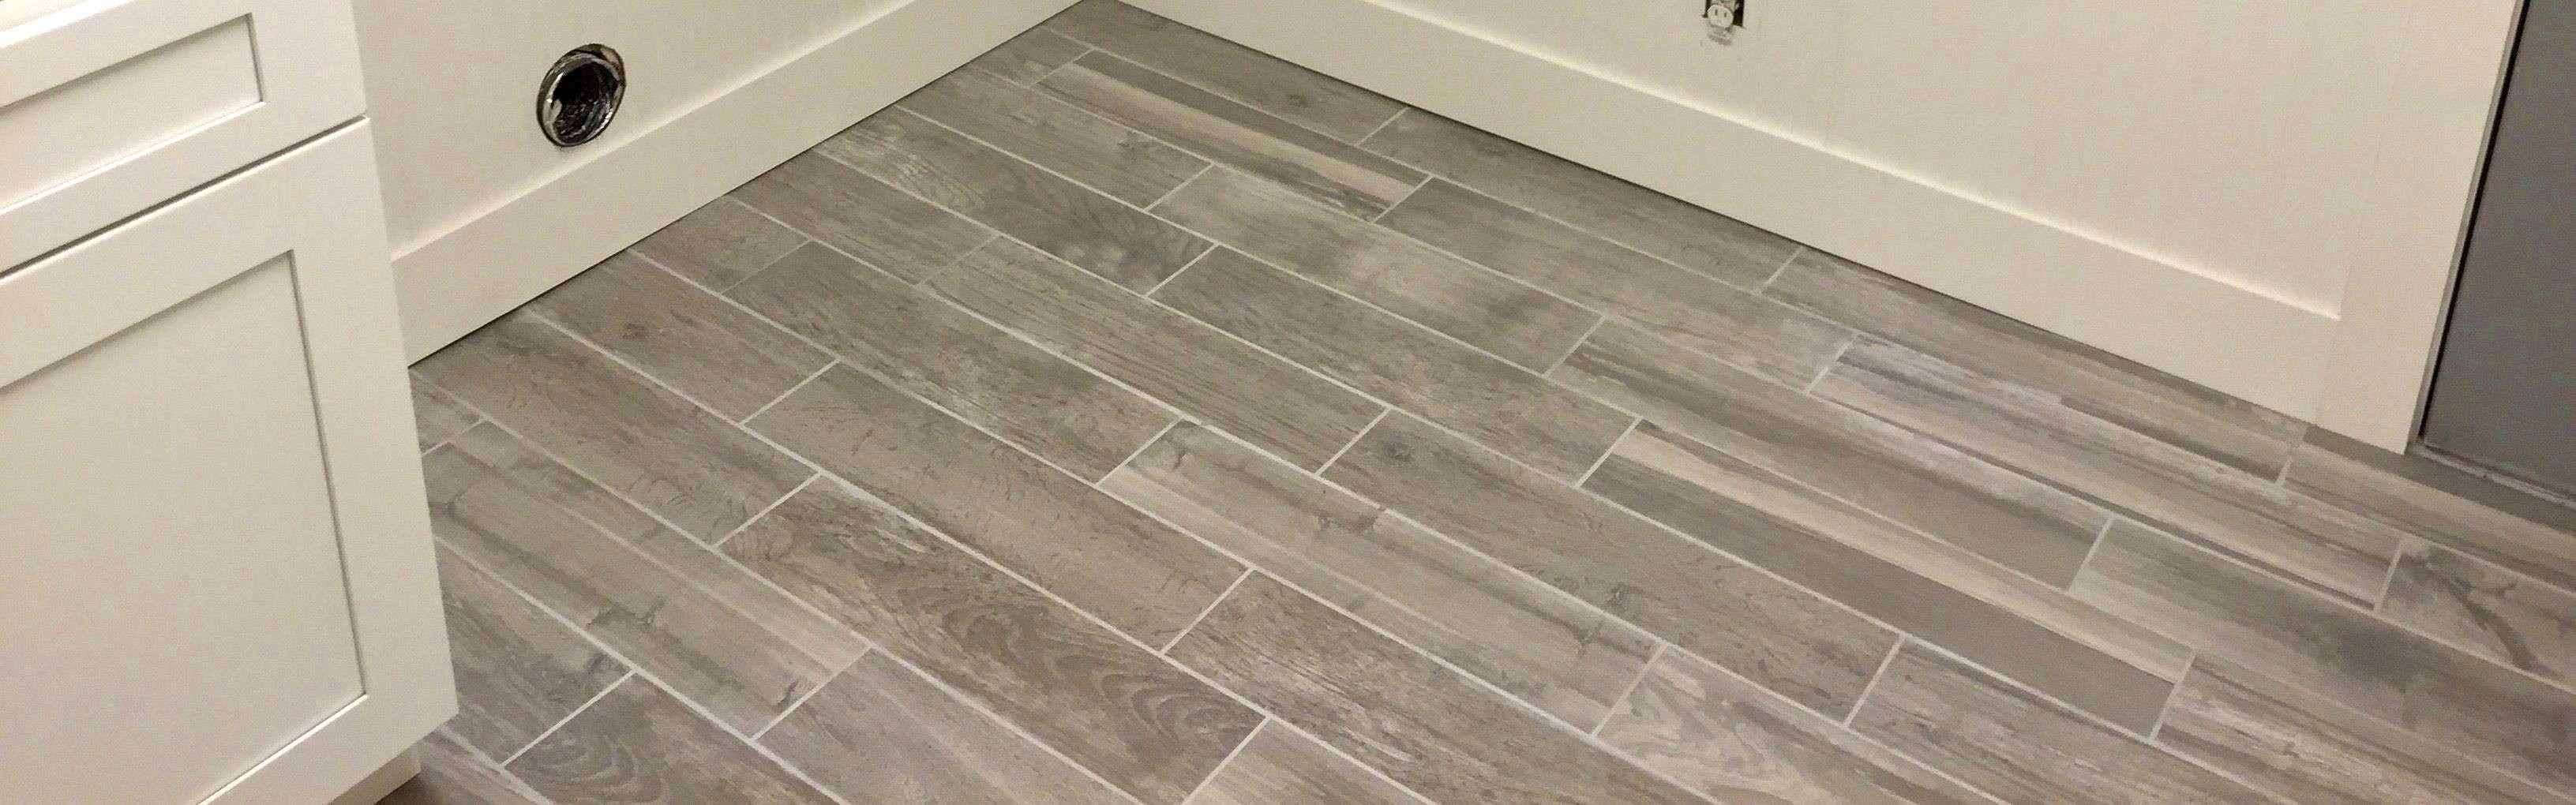 hardwood floor acclimation of laminate floor in bathroom ufficient com regarding laminate floor in bathroom